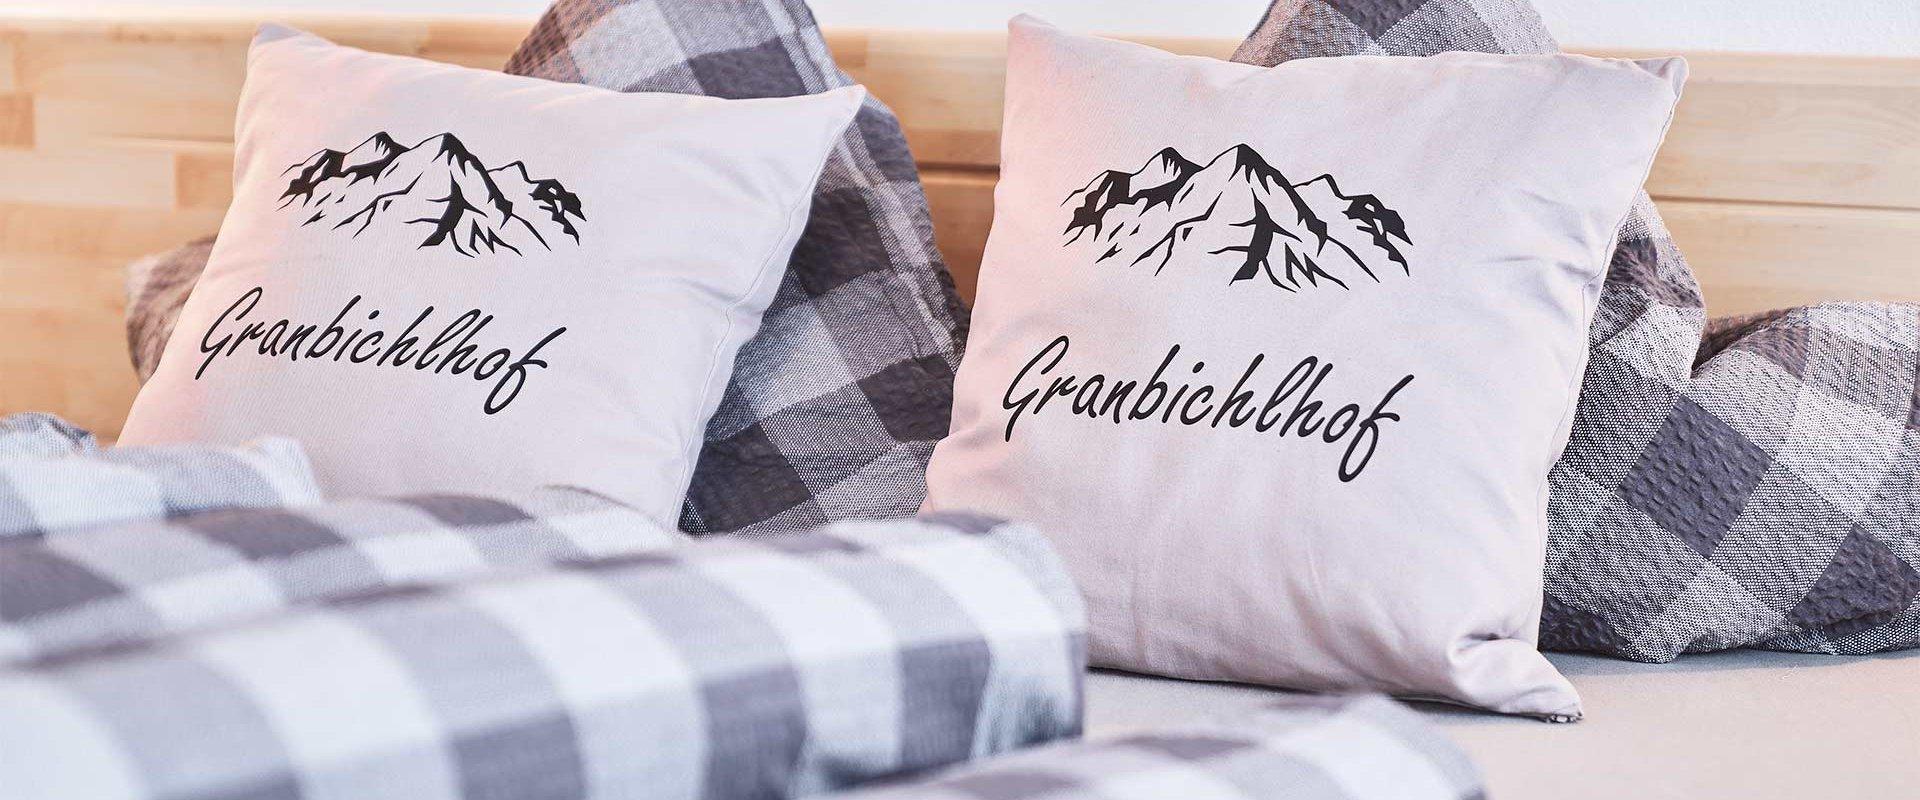 Granbichlhof in Sölden im Ötztal